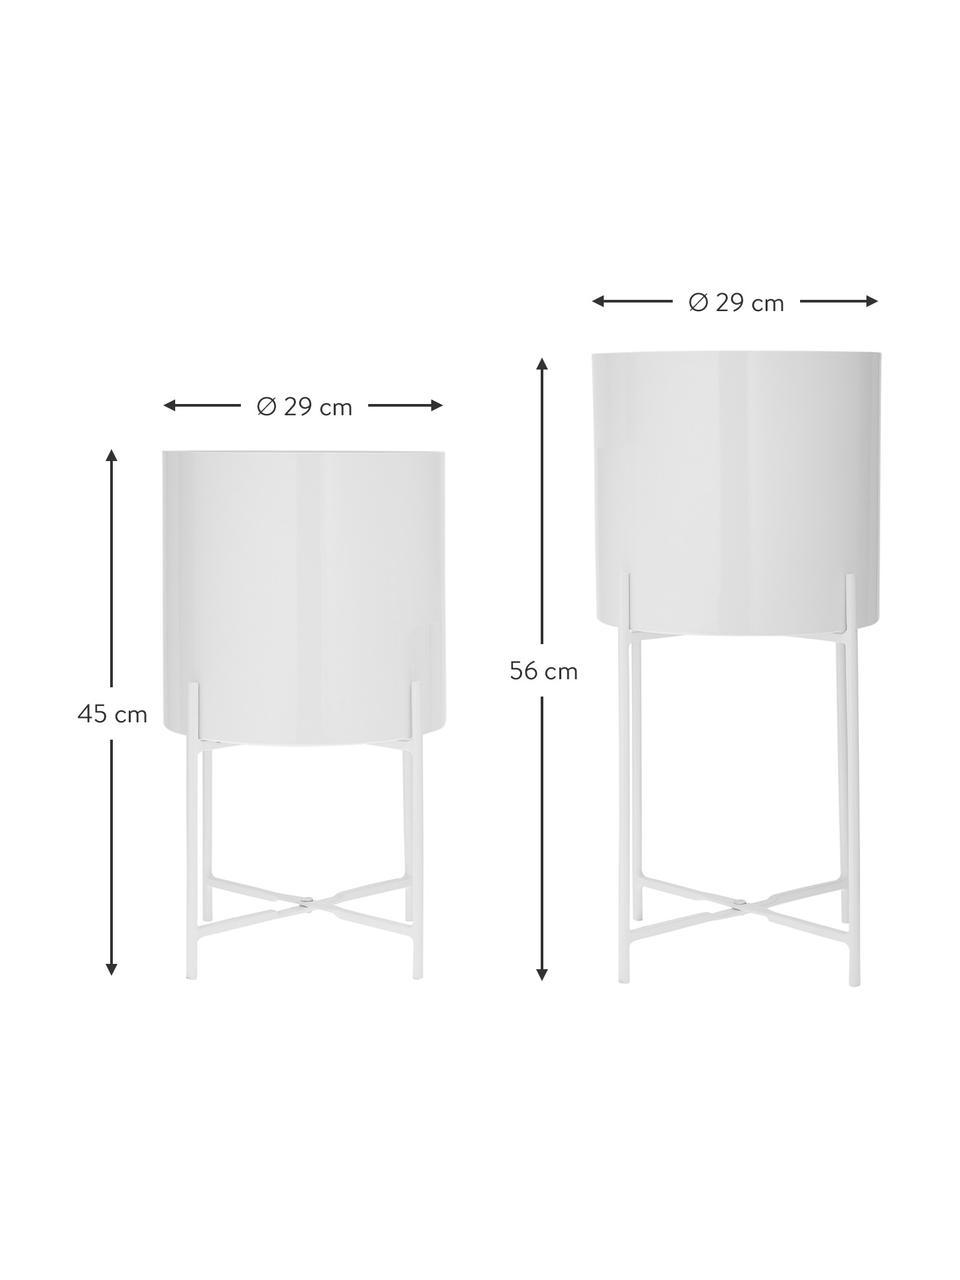 Set 2 portavasi alti in metallo Mina, Metallo verniciato a polvere, Bianco opaco, Set in varie misure